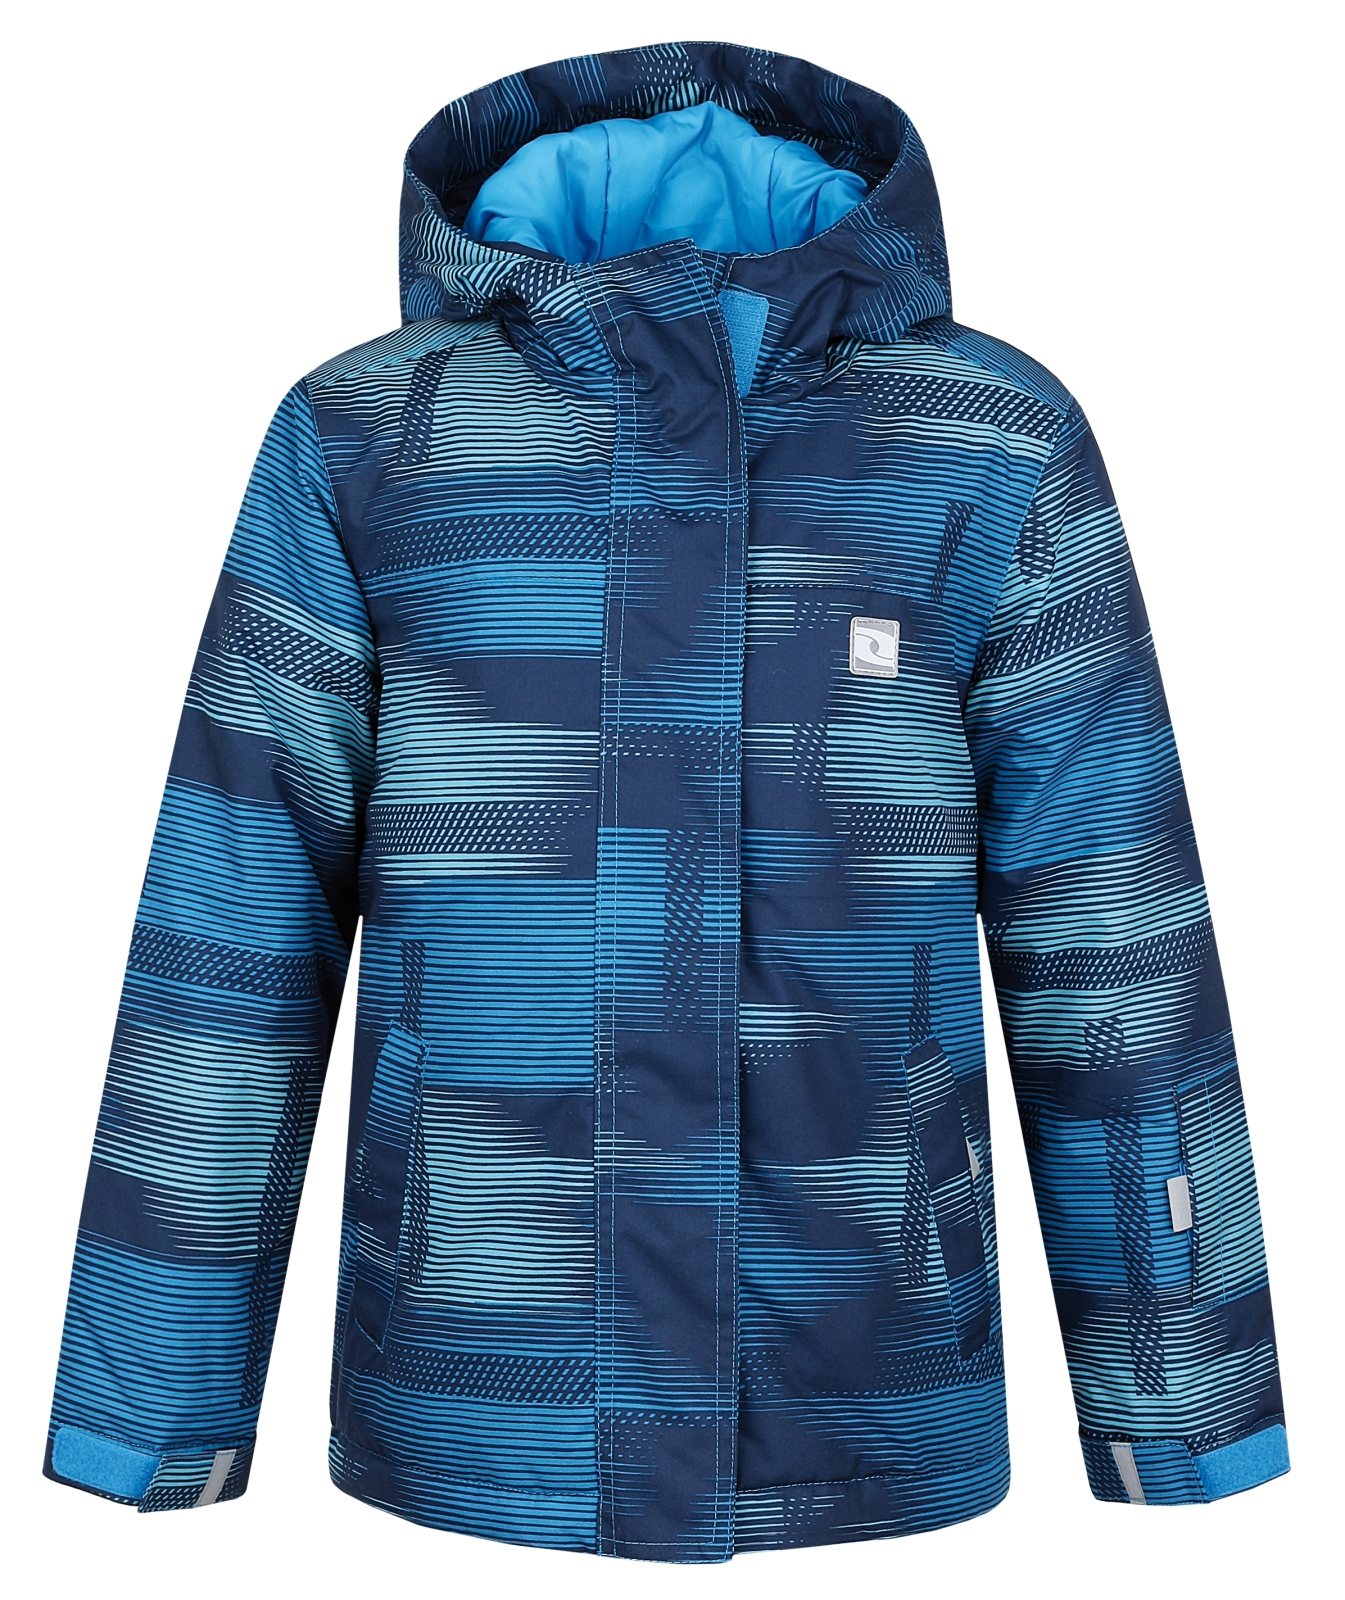 LOAP Chlapčenská lyžiarska bunda Zelma - modrá 6d0d38d0801